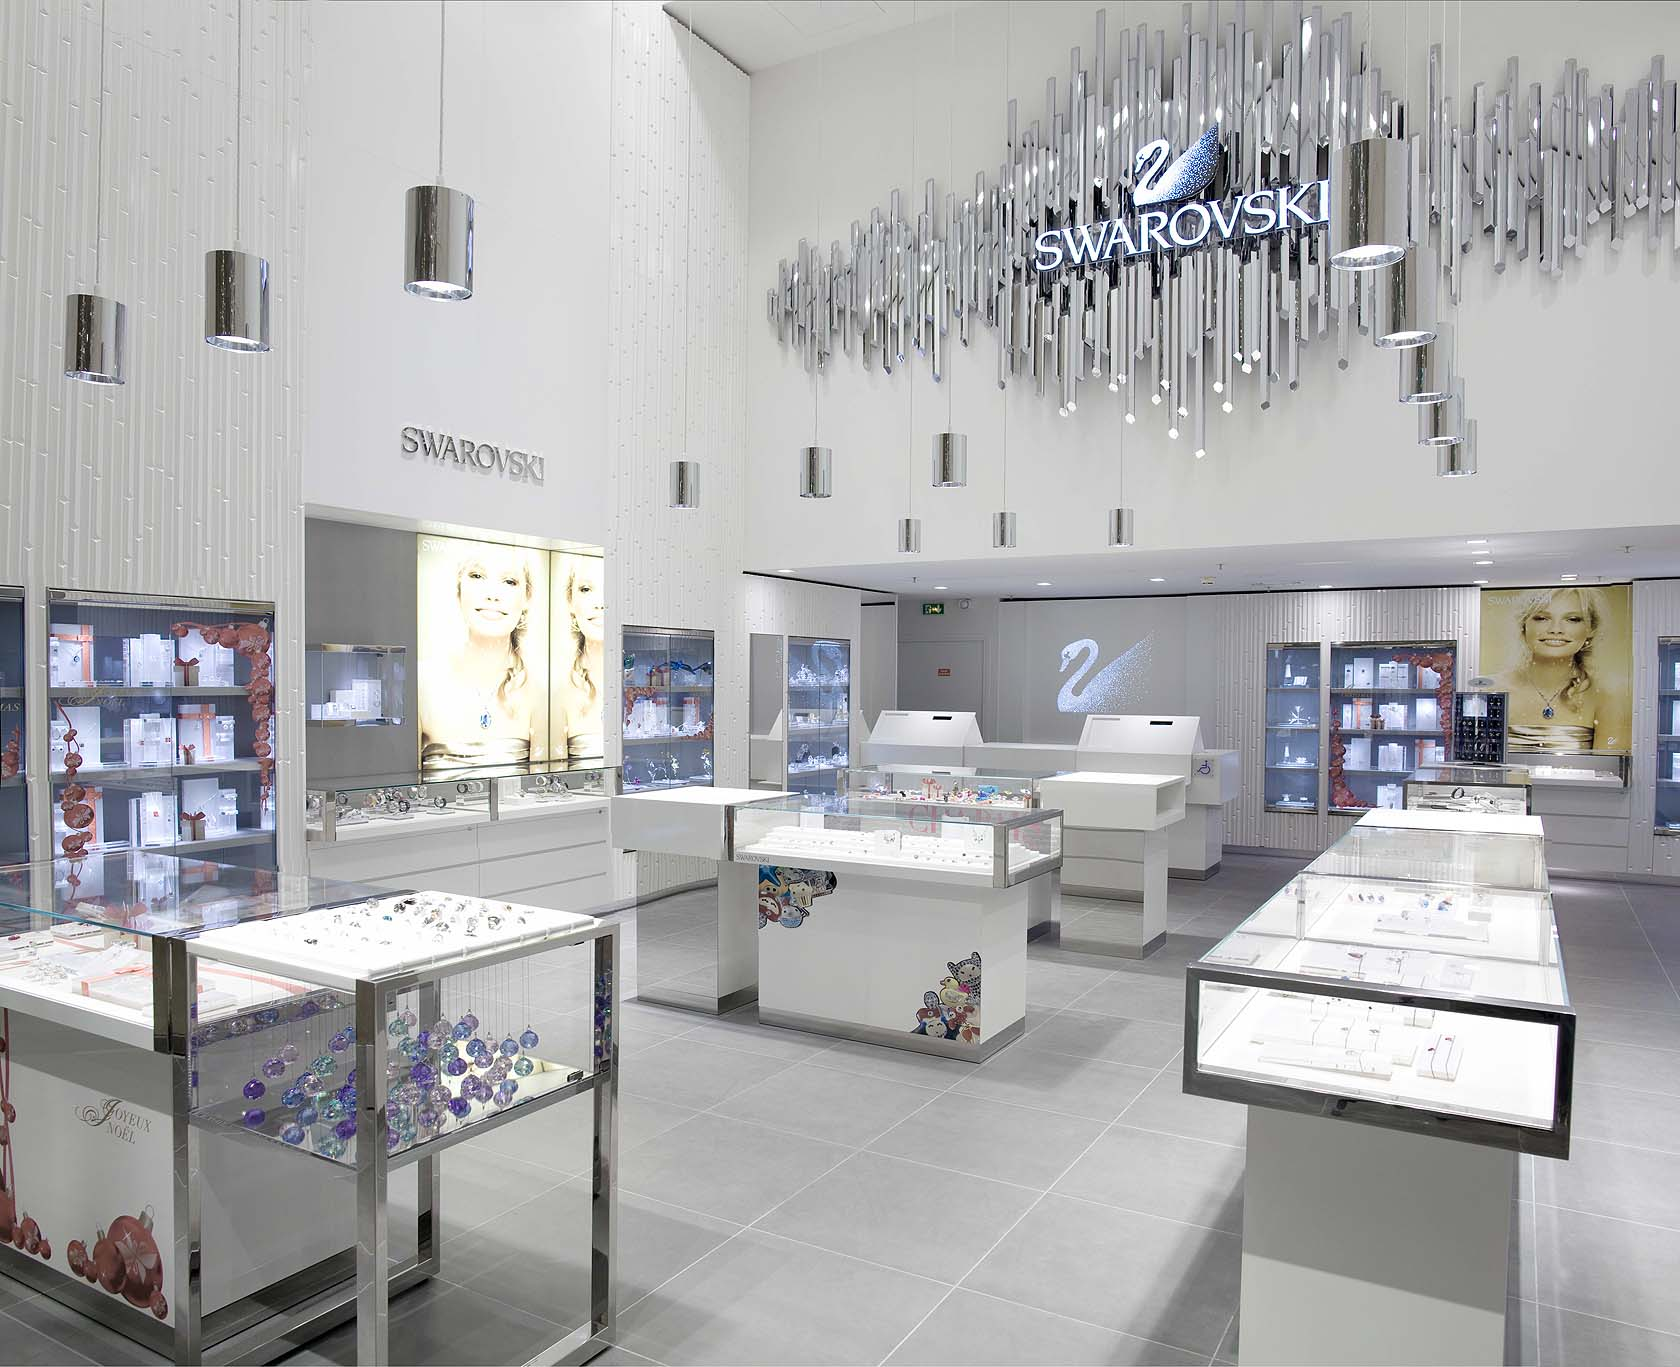 SWAROVSKI jewelry store at Carrousel du Louvre, Paris - SAM l MAU ...